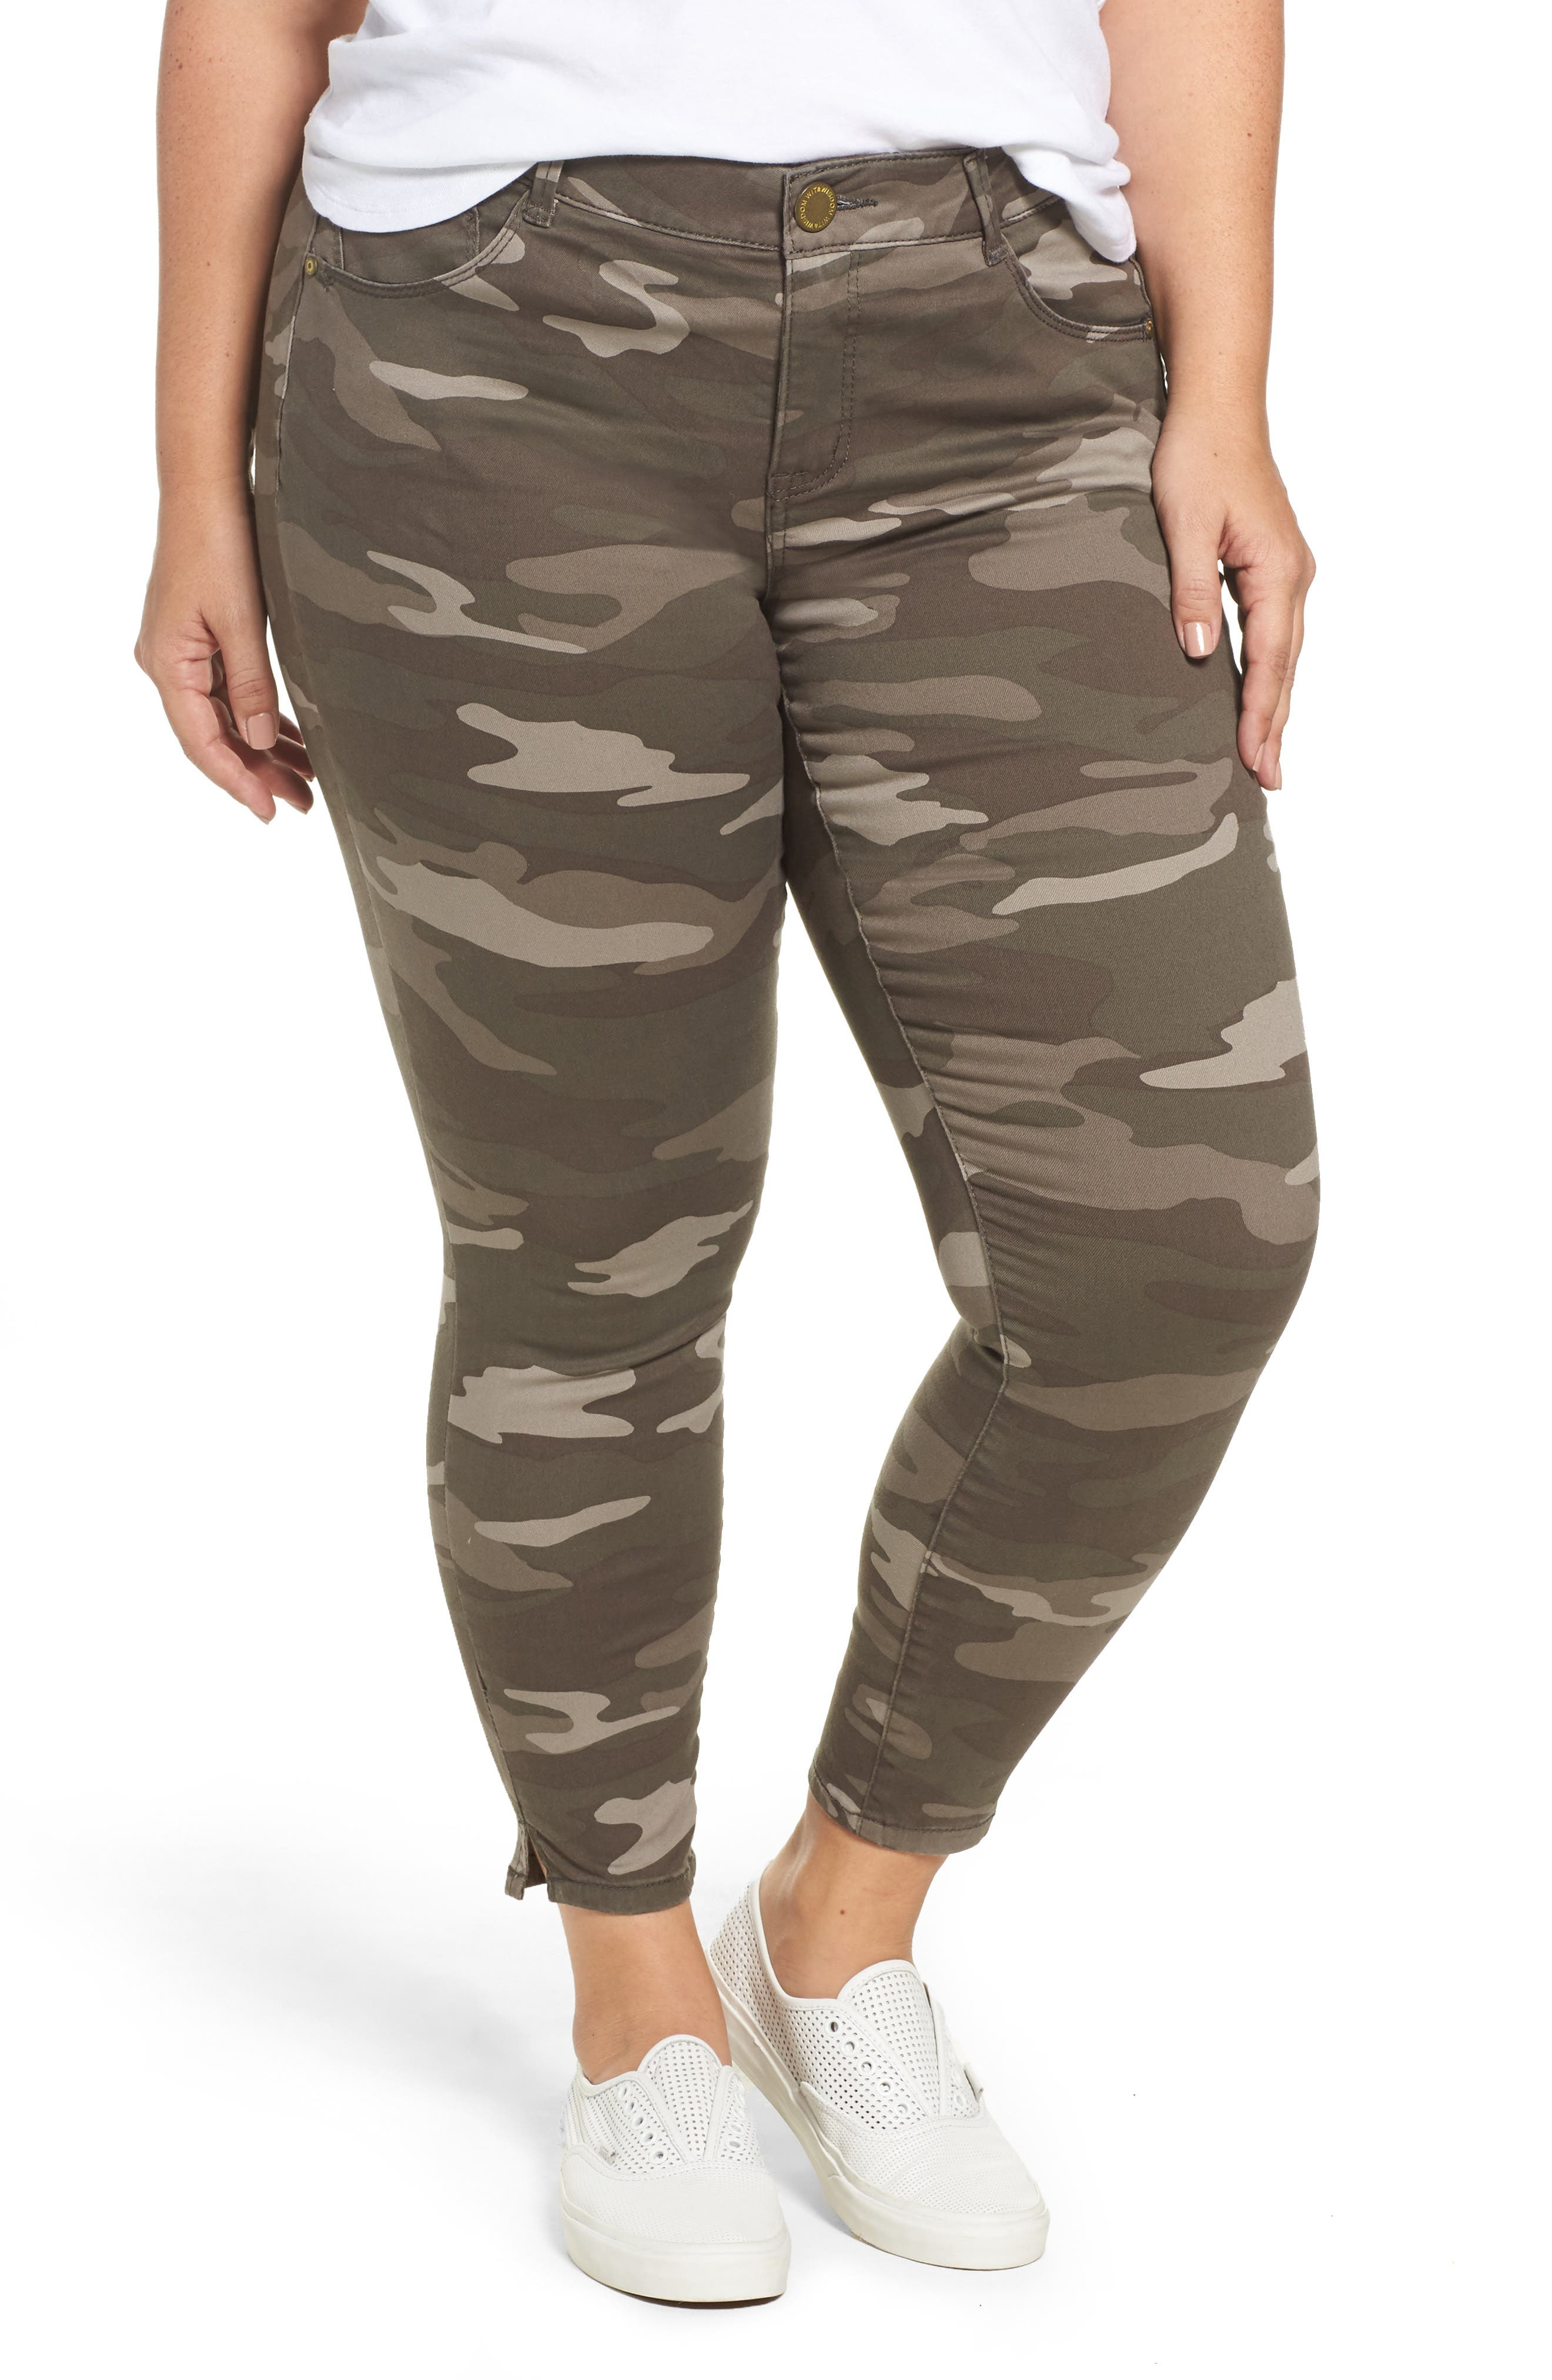 Ab-solution Camo Skinny Pants,                         Main,                         color, 250